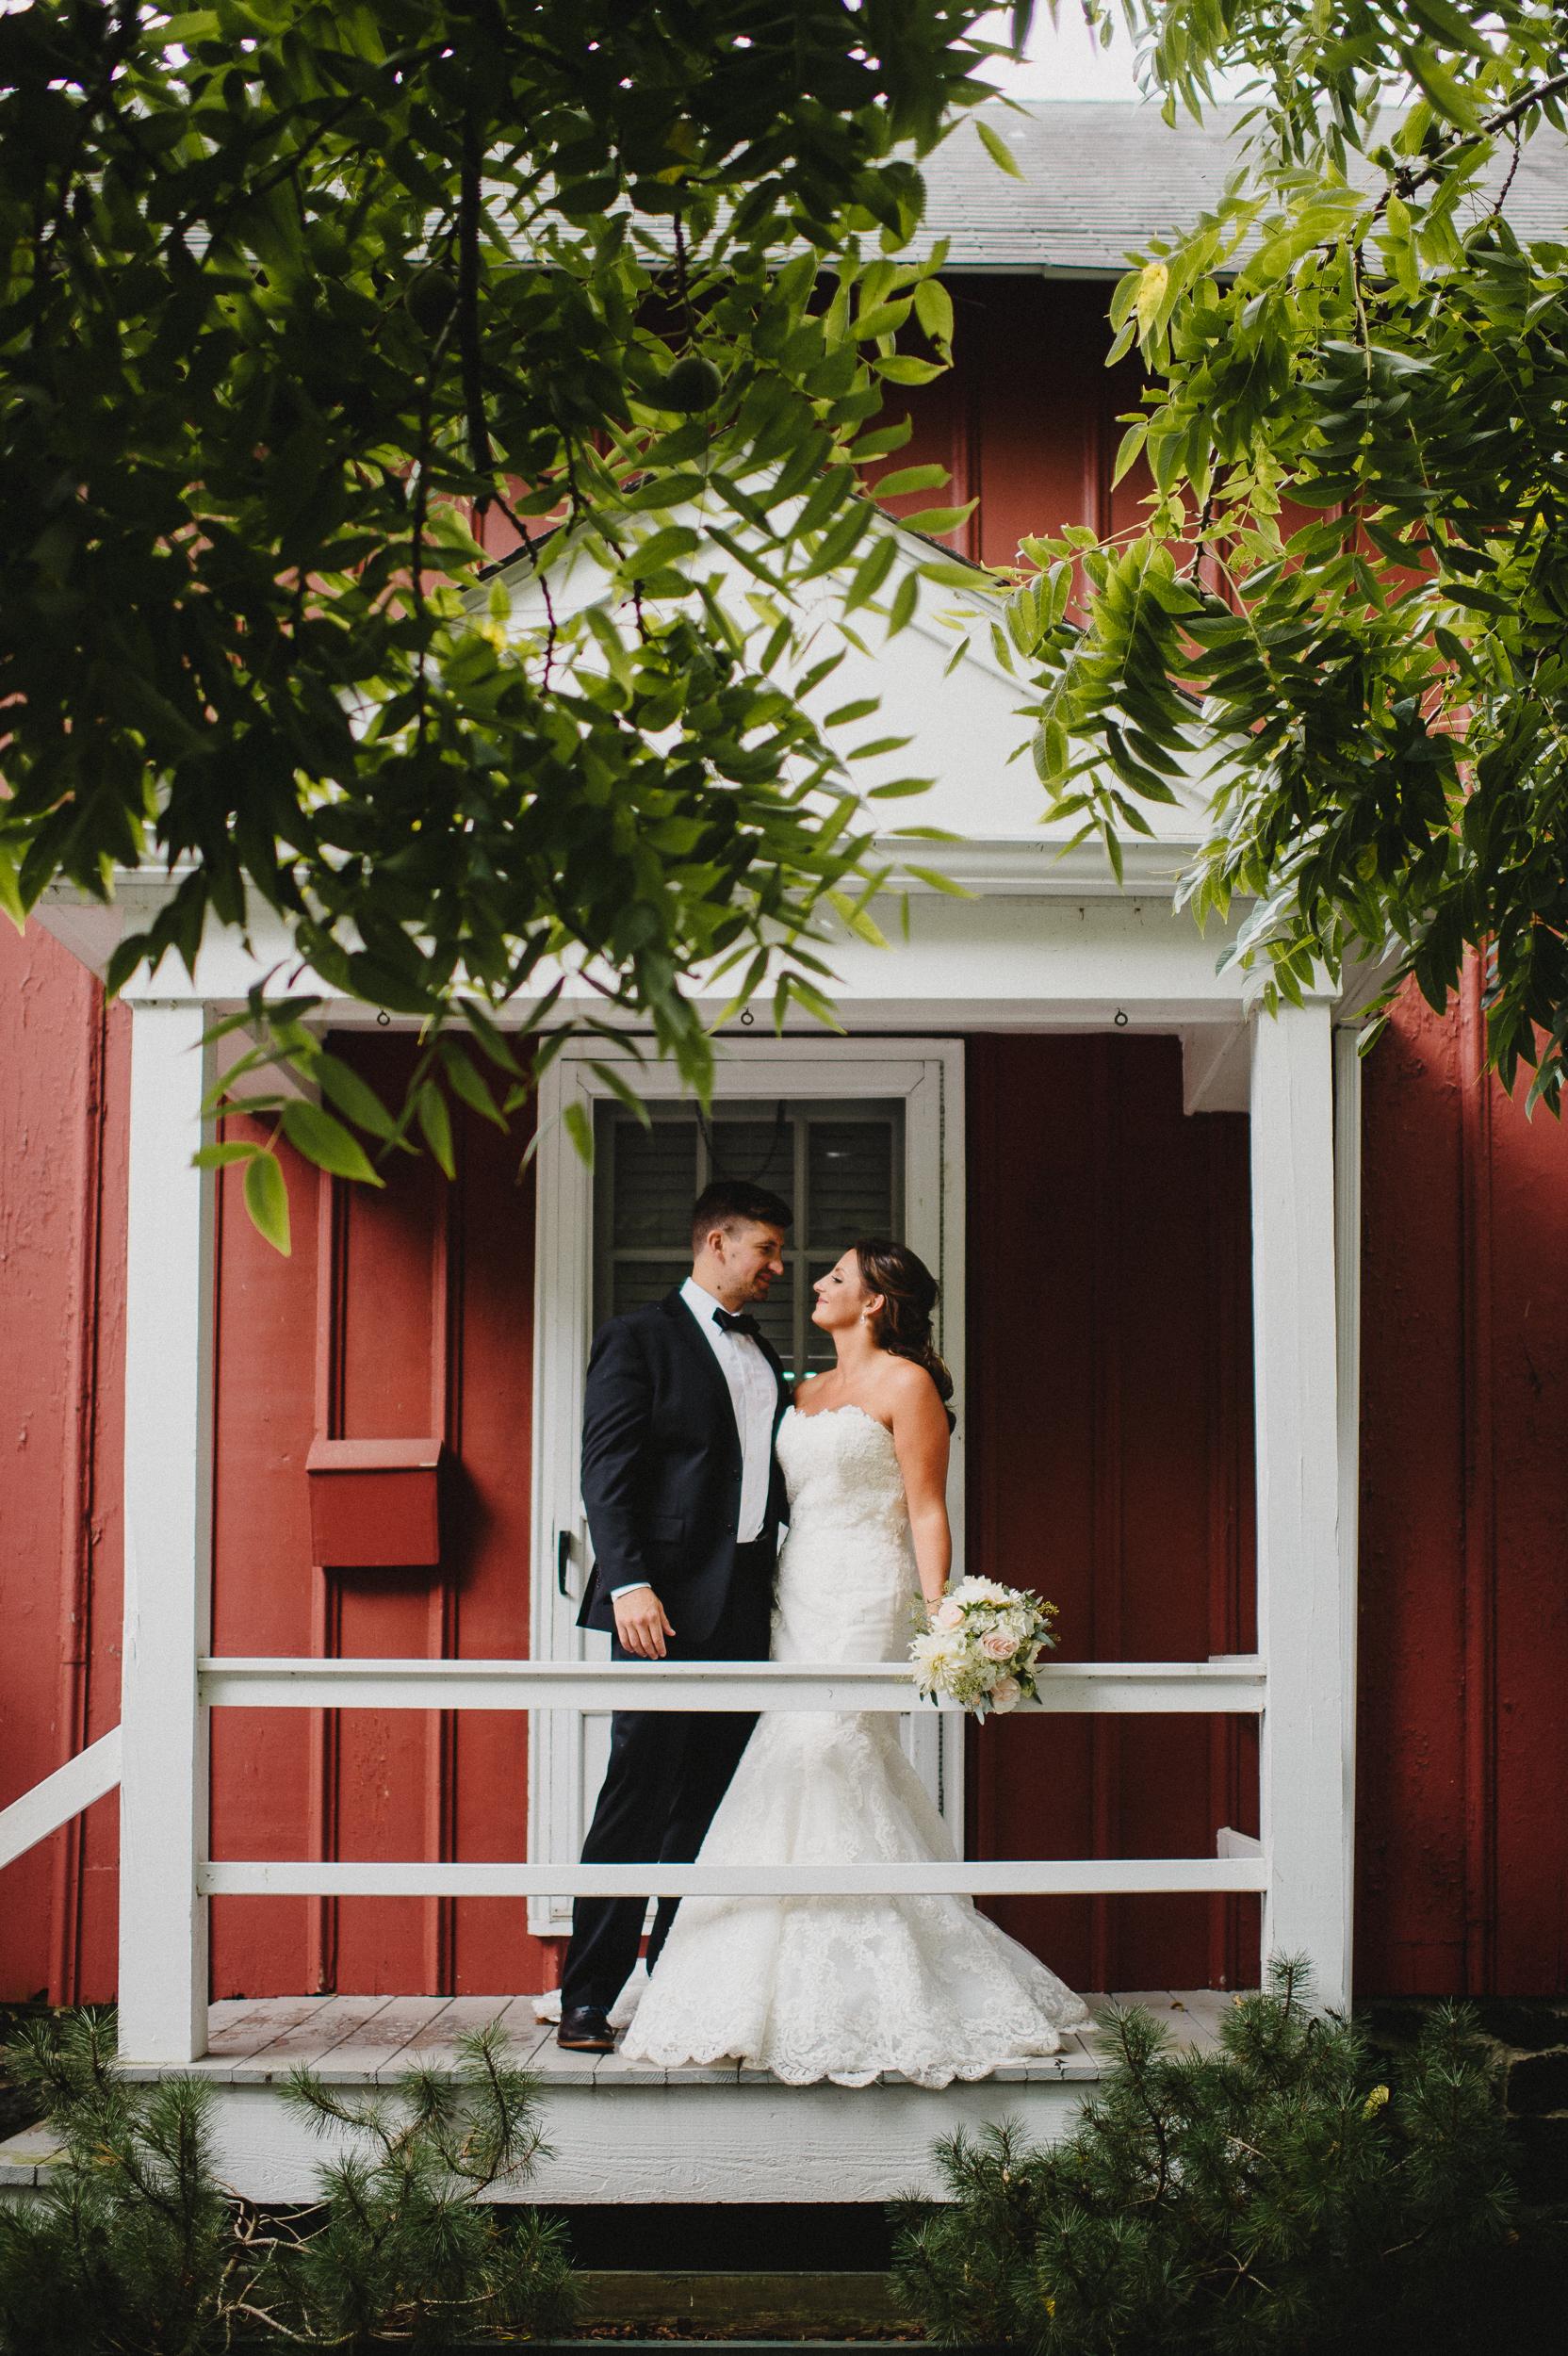 delaware-estate-wedding-photographer-pat-robinson-photography-66.jpg